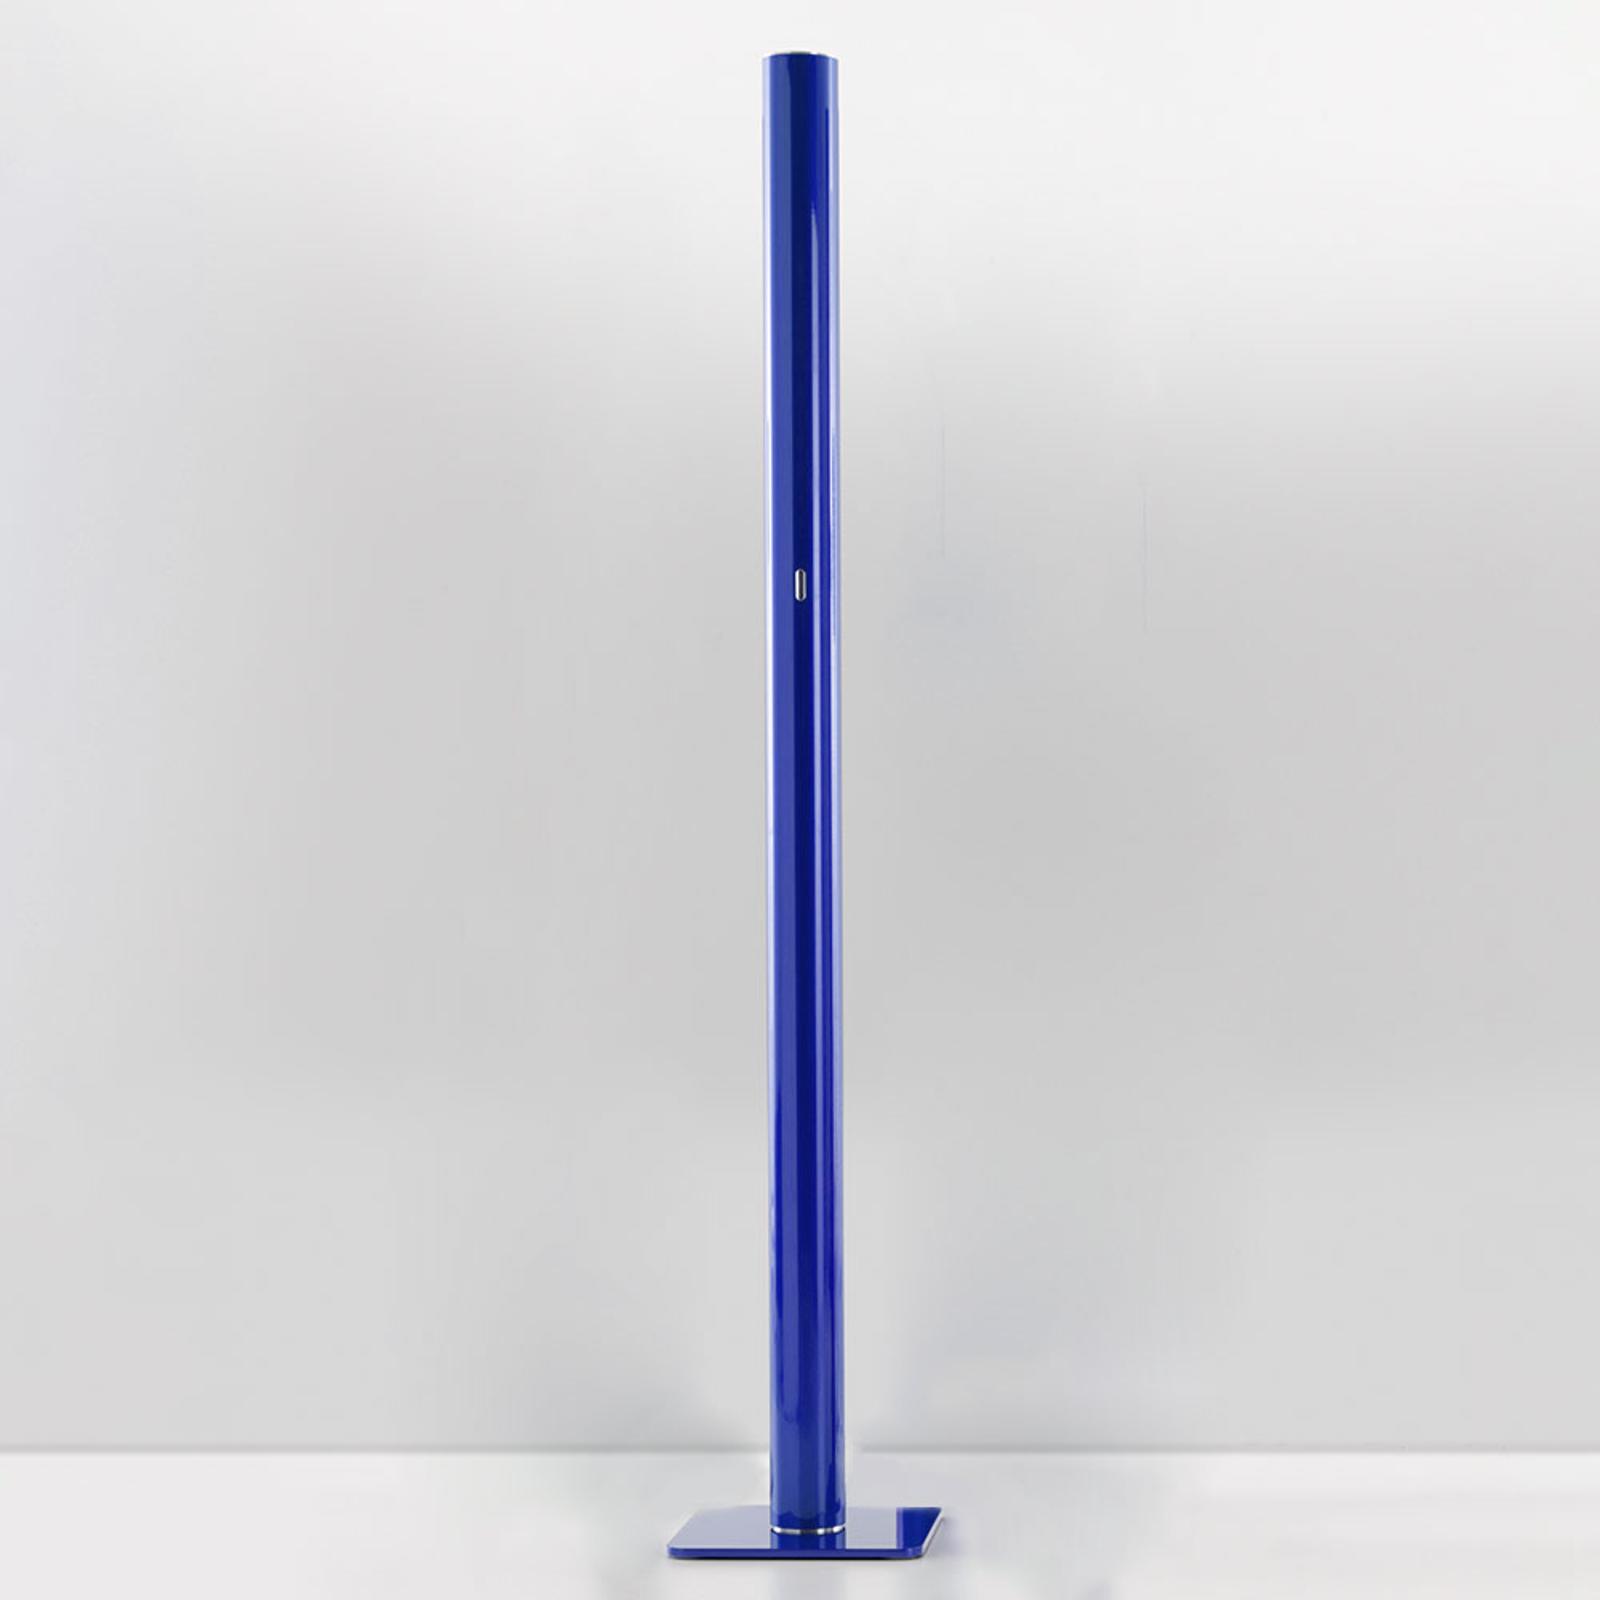 Artemide Ilio - LED-Stehleuchte, App, blau, 3000K